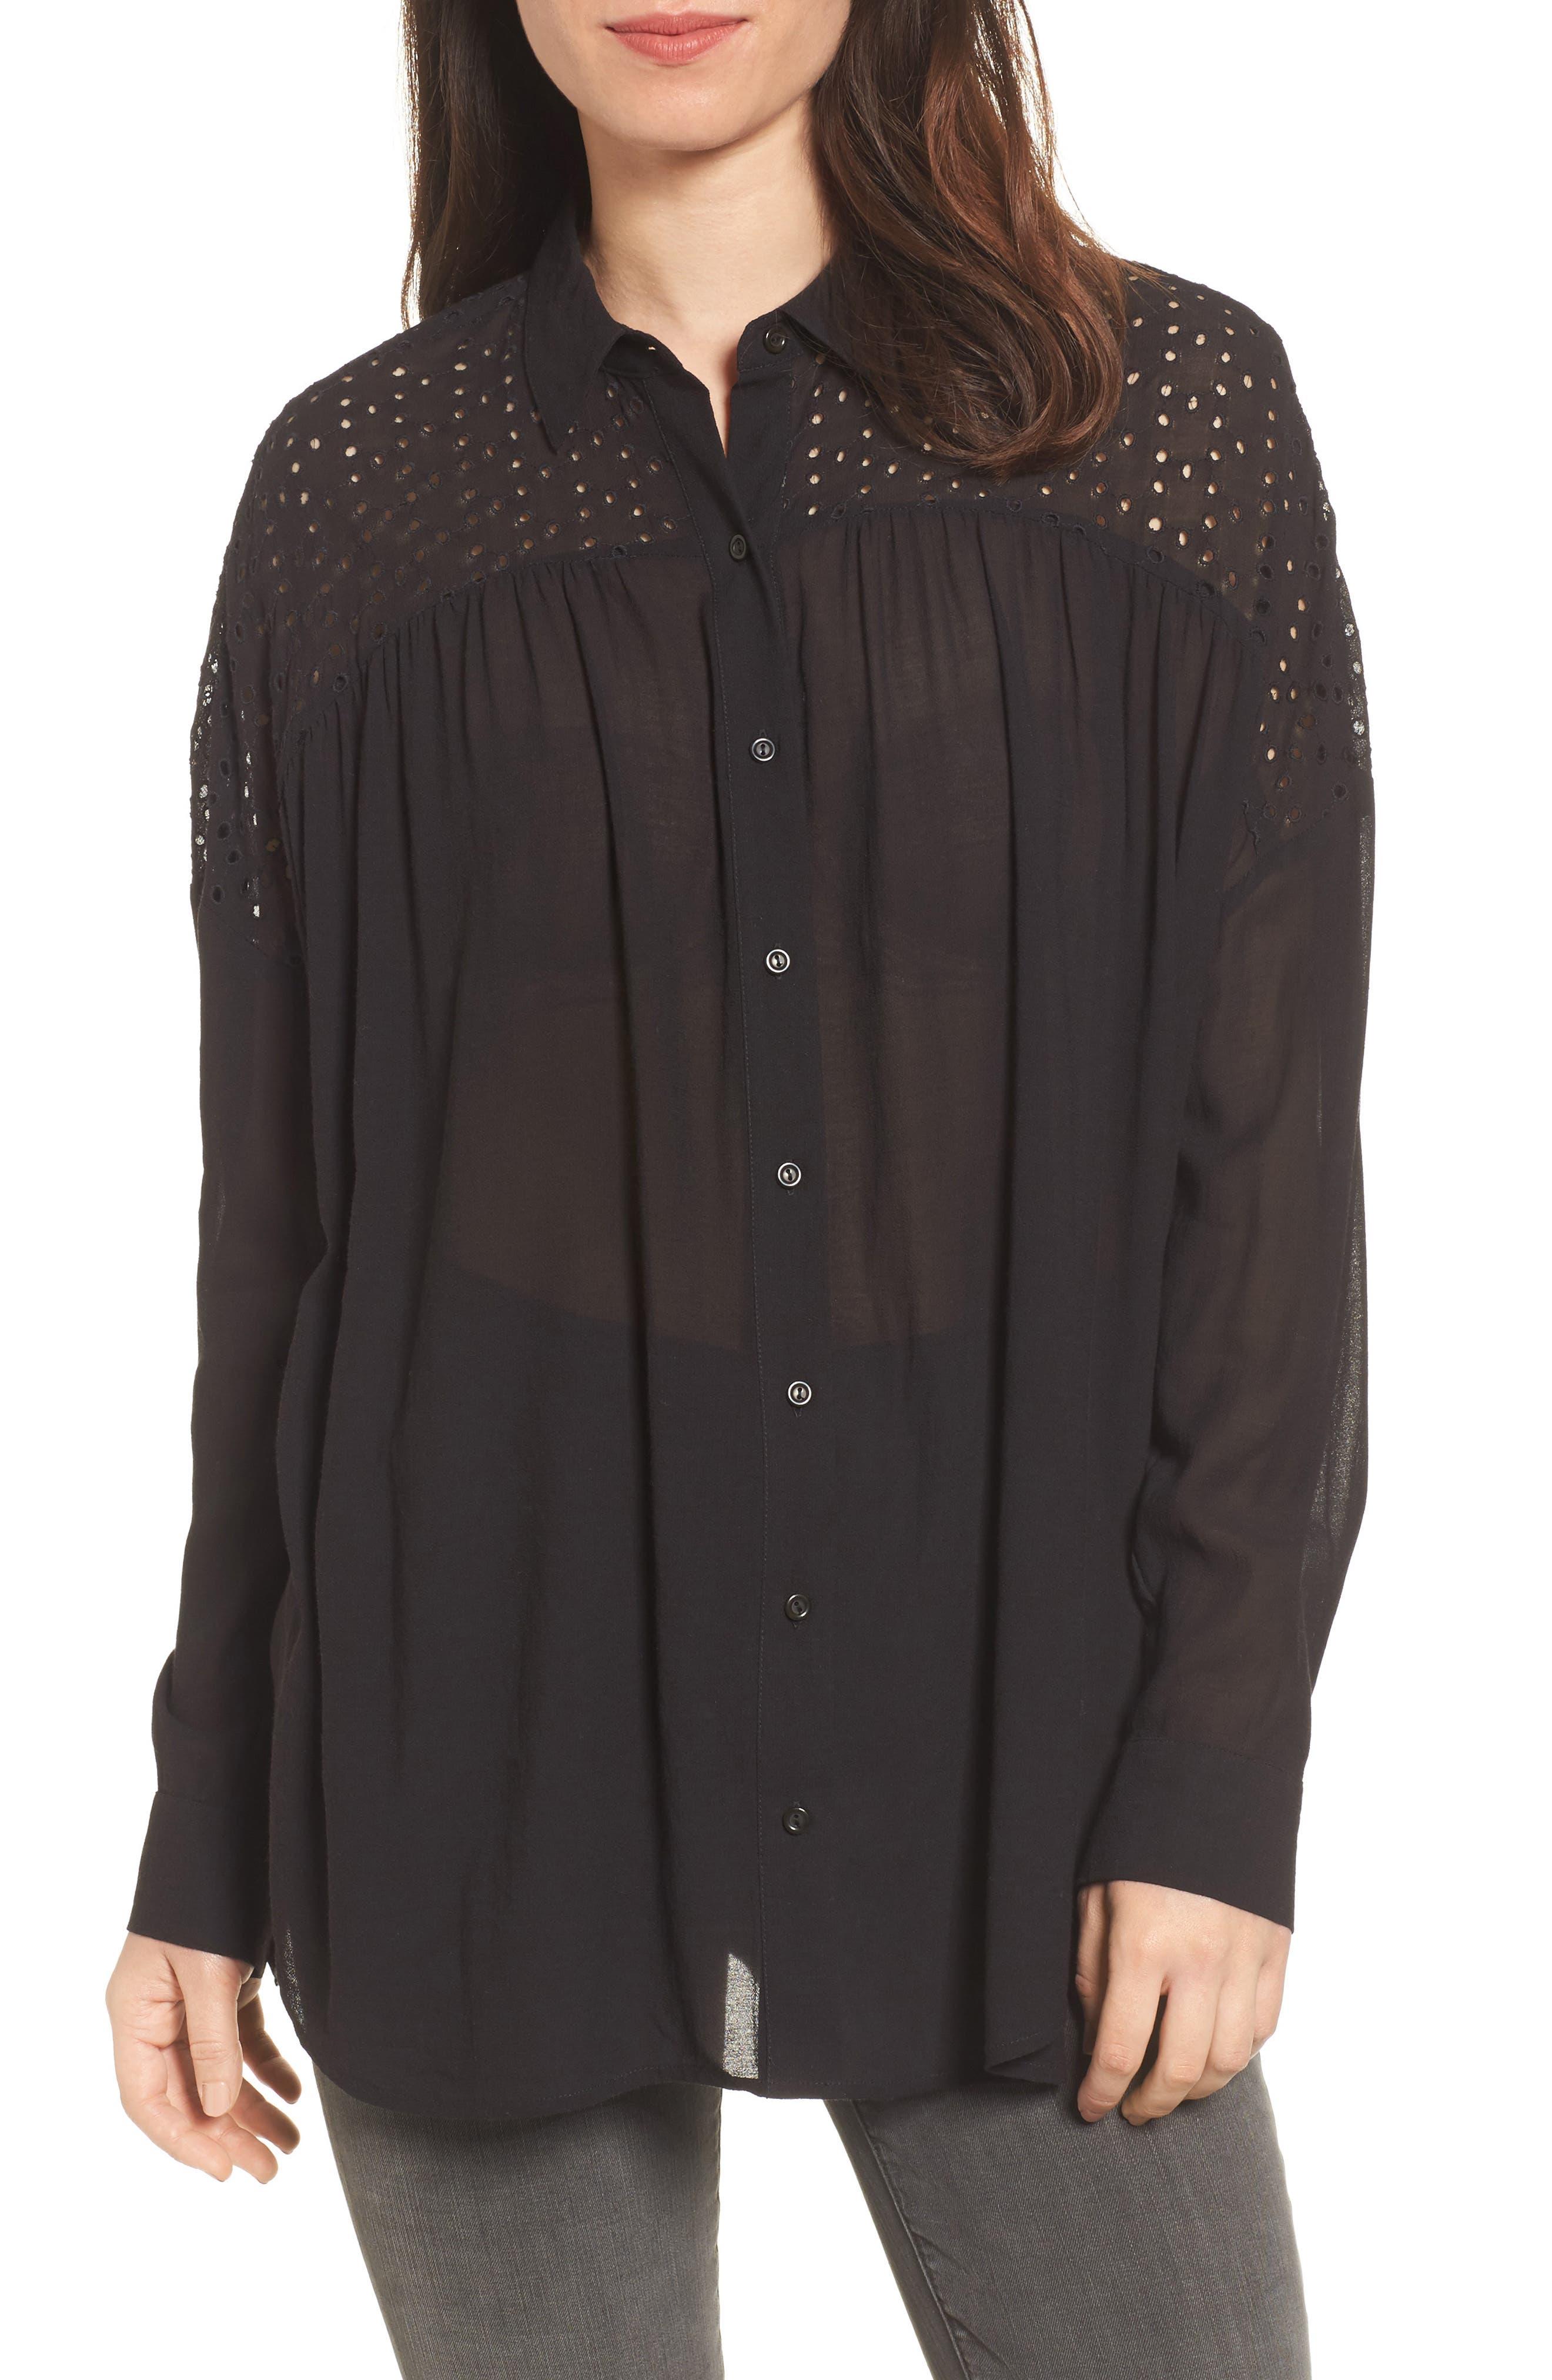 Pearla Shirt,                         Main,                         color,